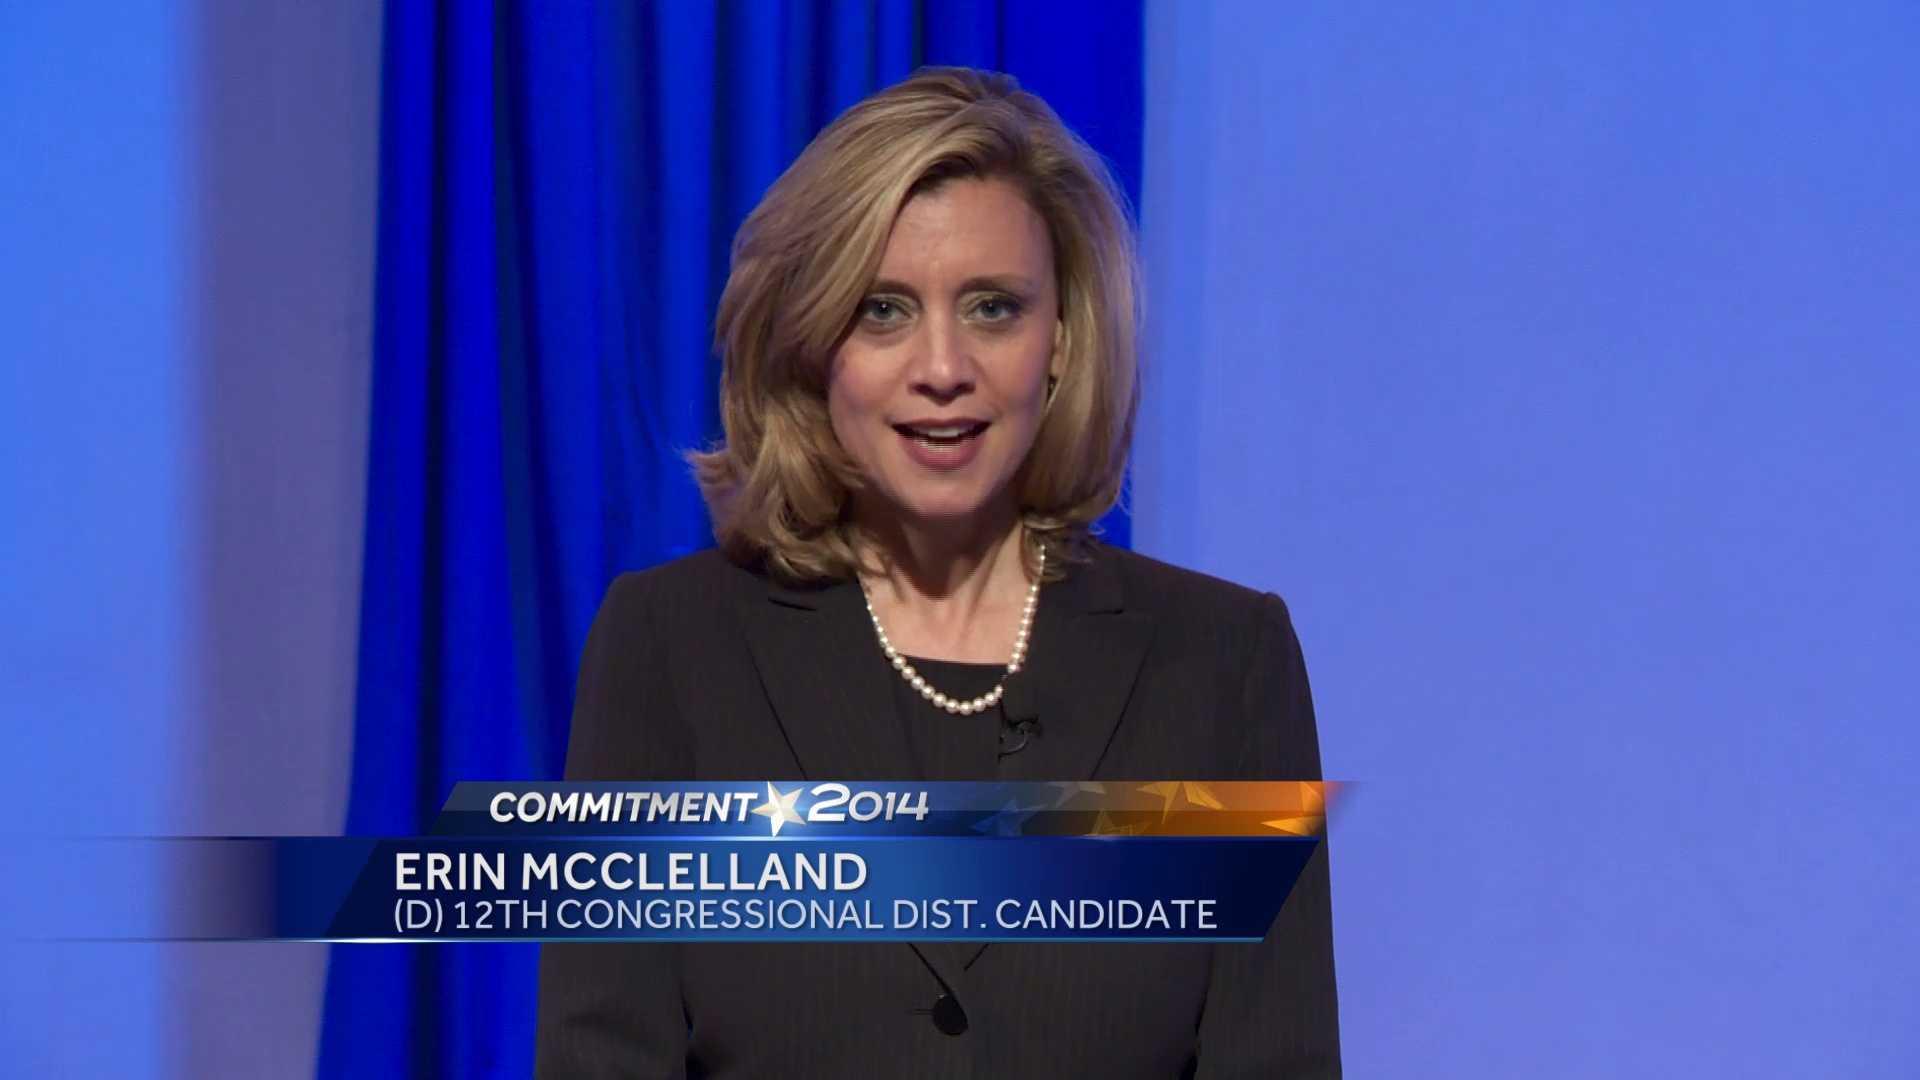 (Democrat) 12th Congressional District Candidate